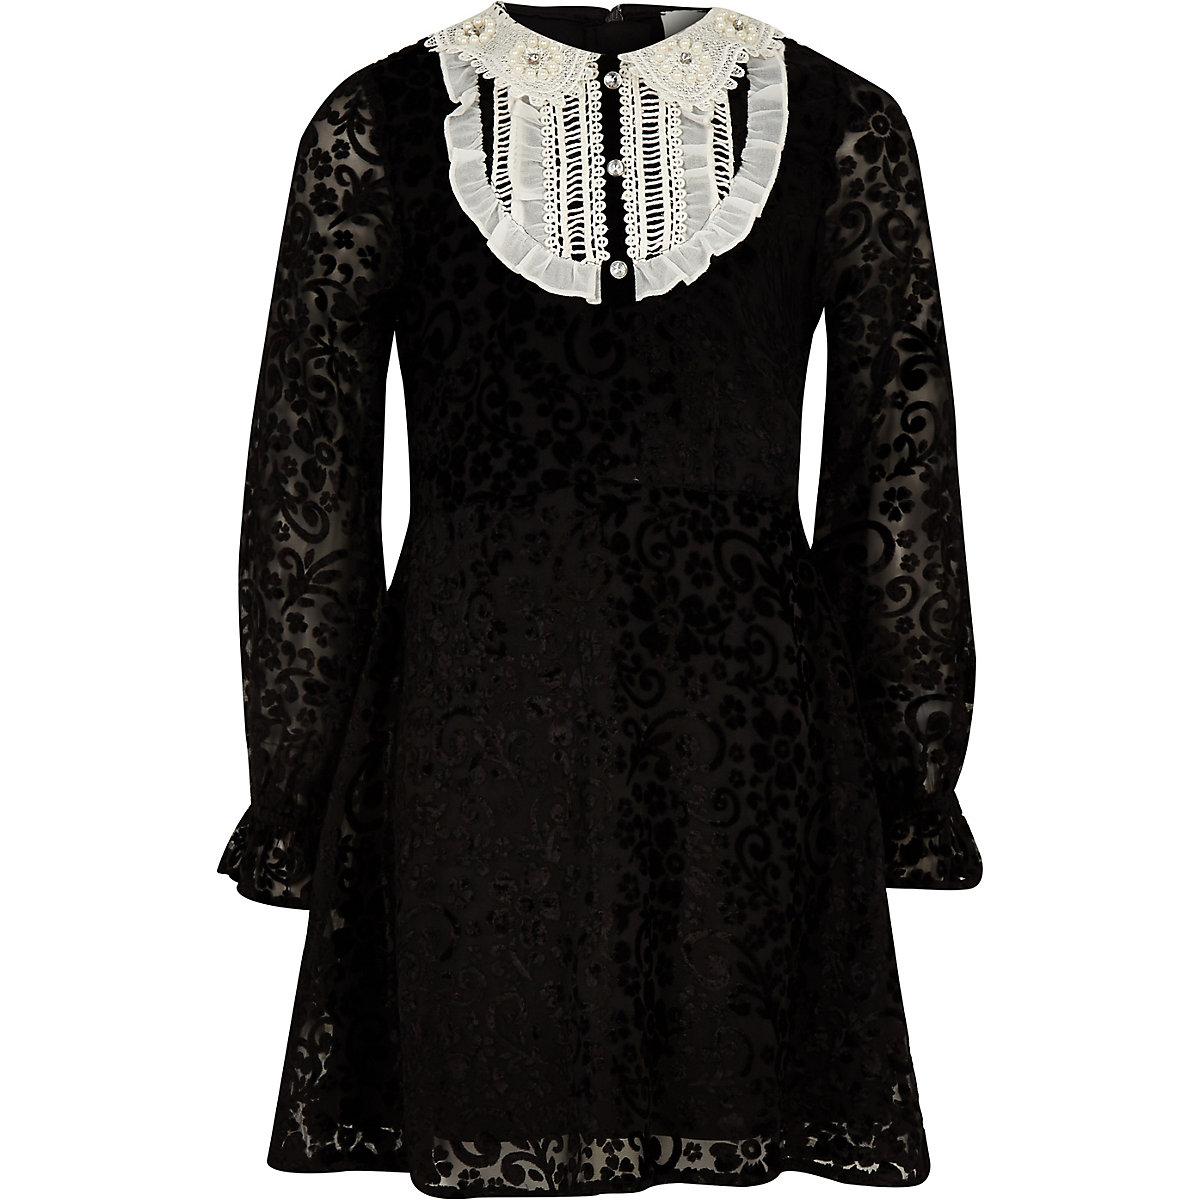 Girls black lace front collar shift dress